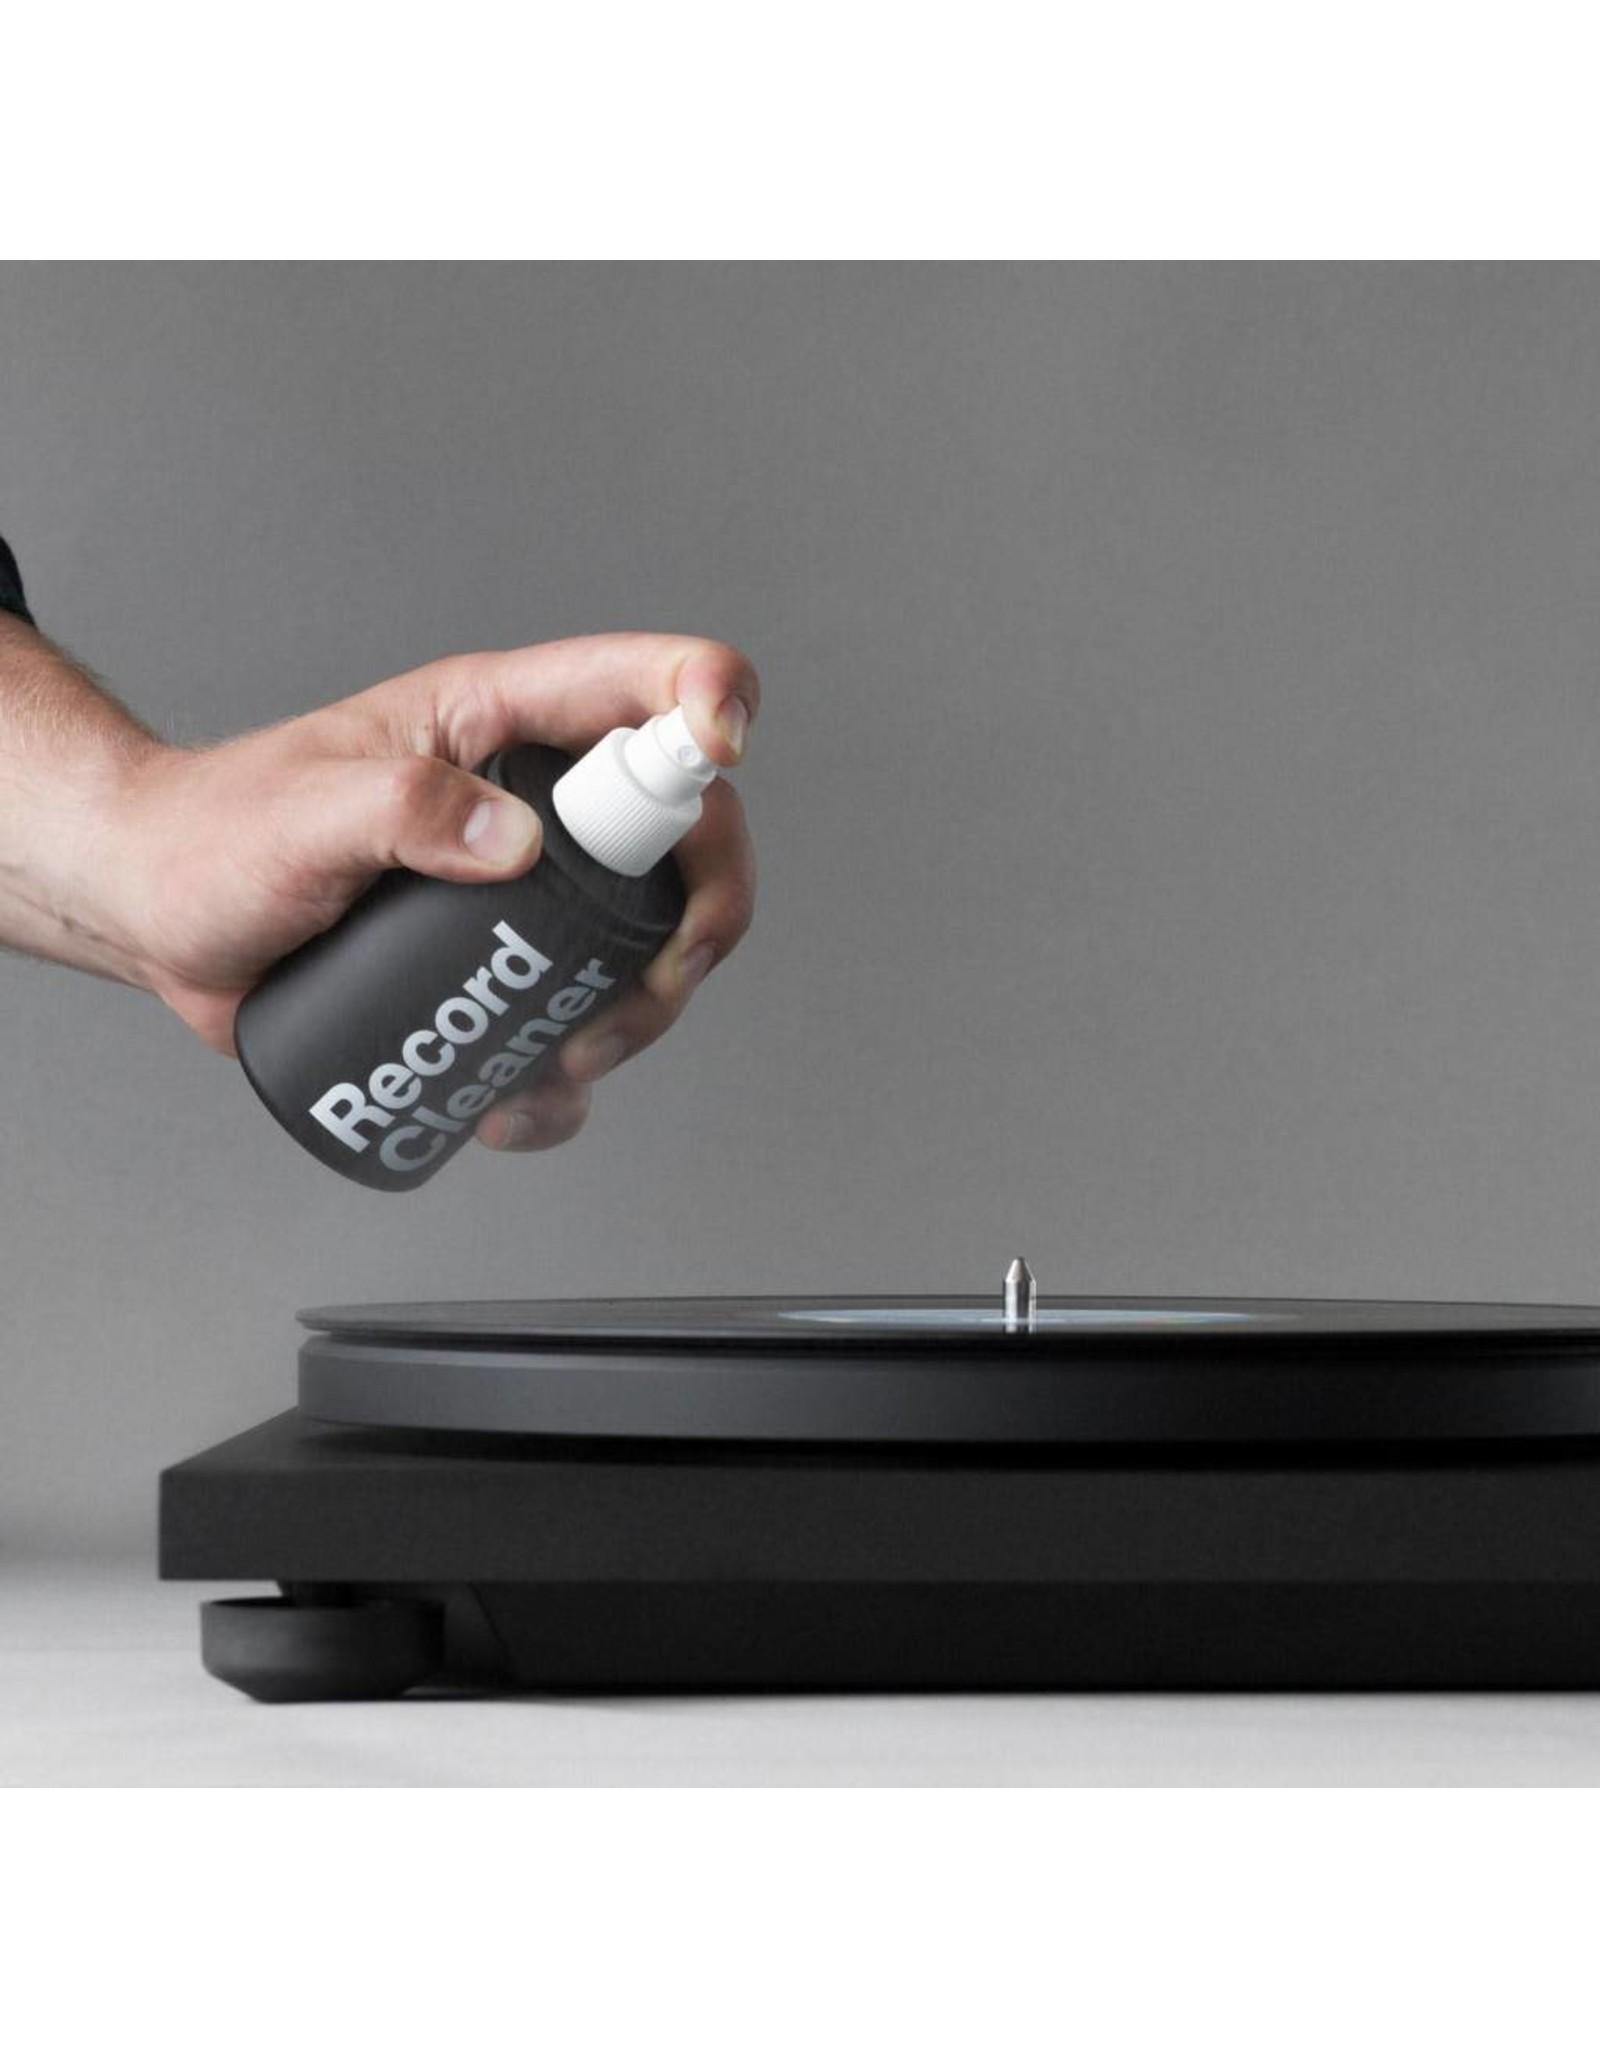 AM Clean Sound AM Clean Sound: Record Cleaner